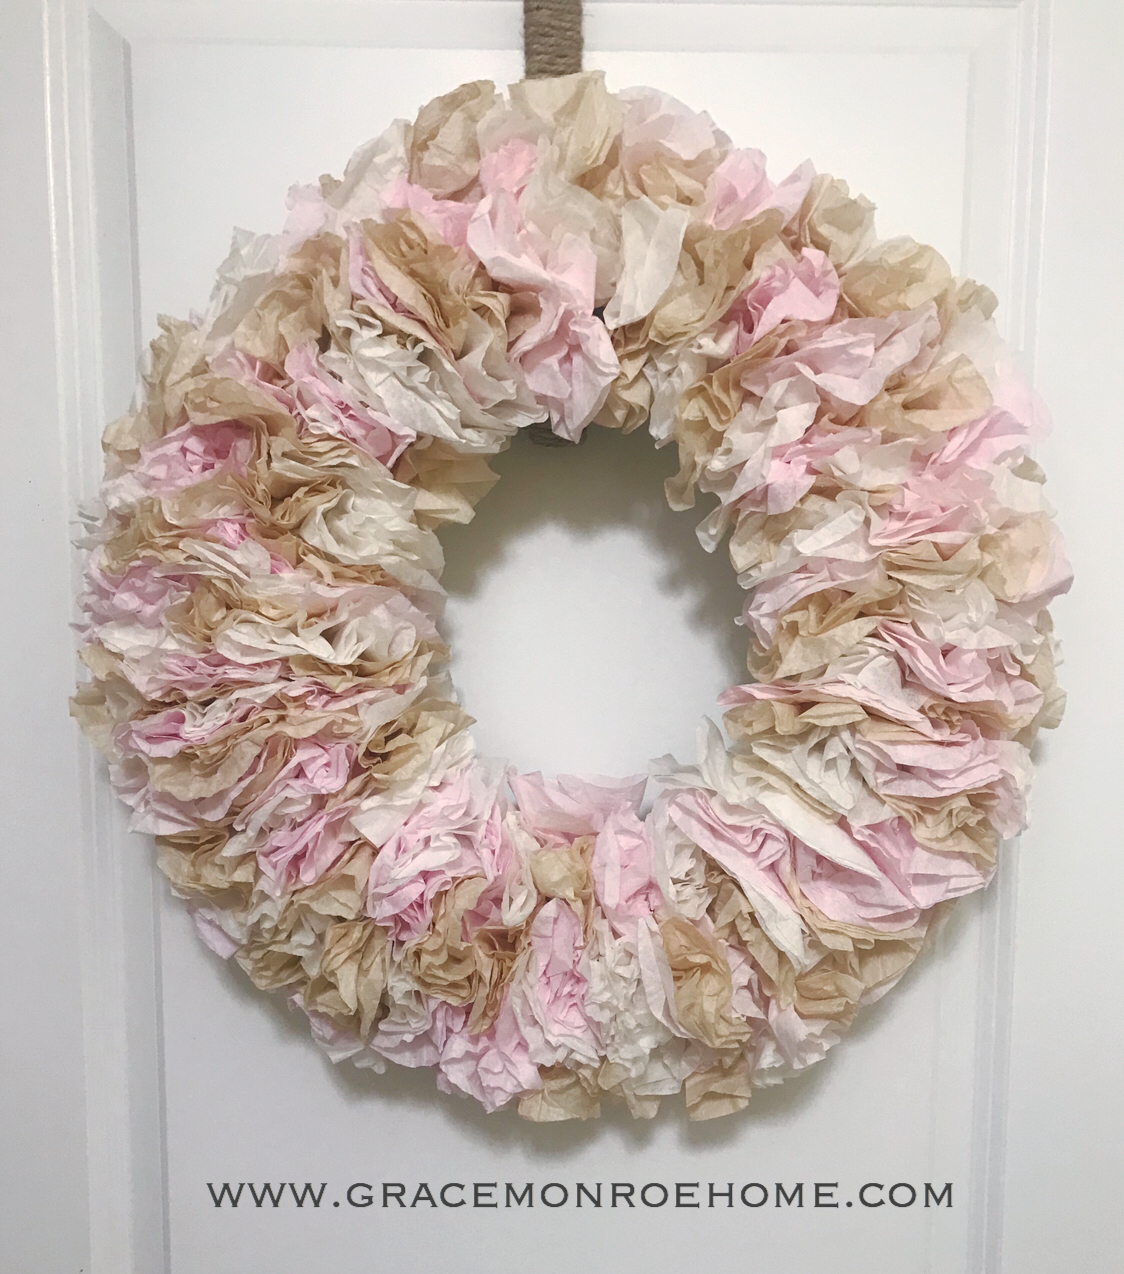 Coffee Filter Wreath | Grace Monroe Home